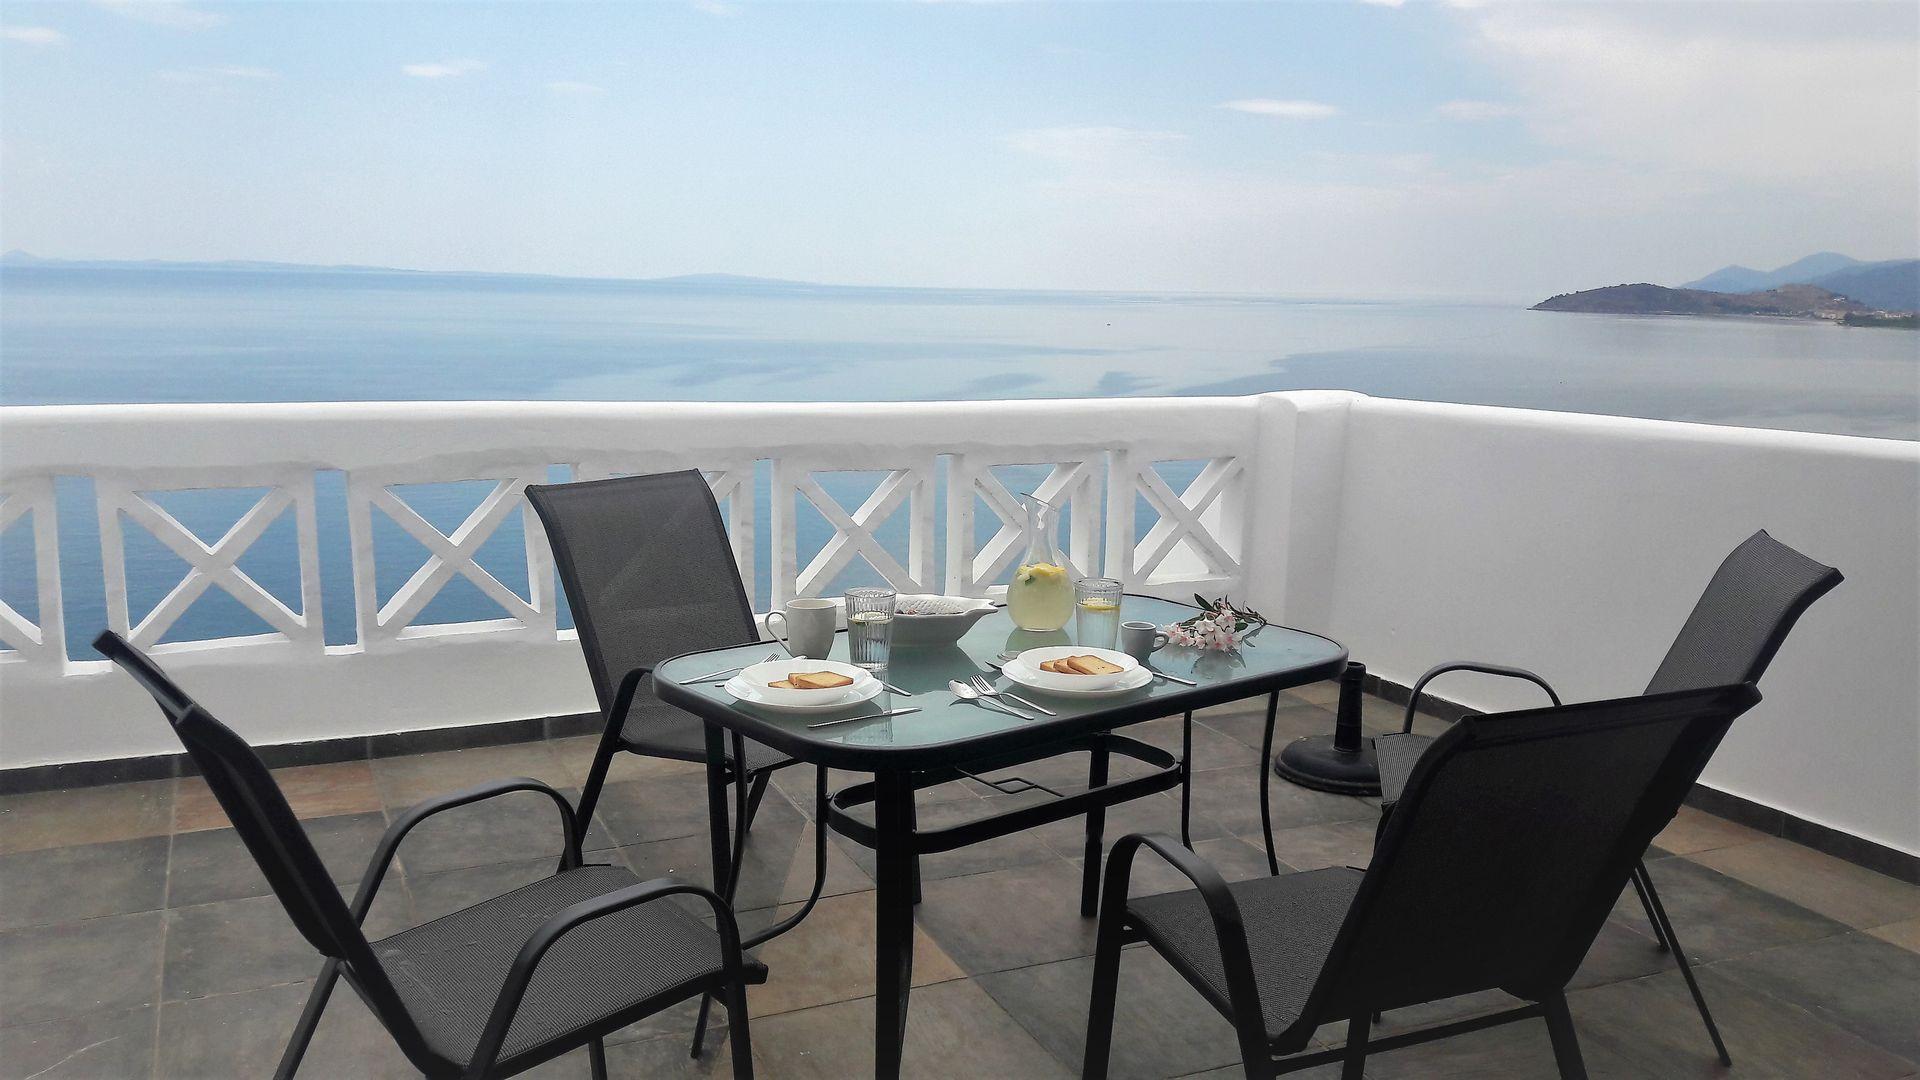 Muses SeaSide Villas - Παράλιο Άστρος, Κυνουρία ✦ 3 Ημέρες (2 Διανυκτερεύσεις) ✦ 2 άτομα + 1 παιδί έως 3 ετών ✦ Χωρίς Πρωινό ✦ 01/06/2021 έως 30/06/2021 ✦ Κοντά σε παραλία!